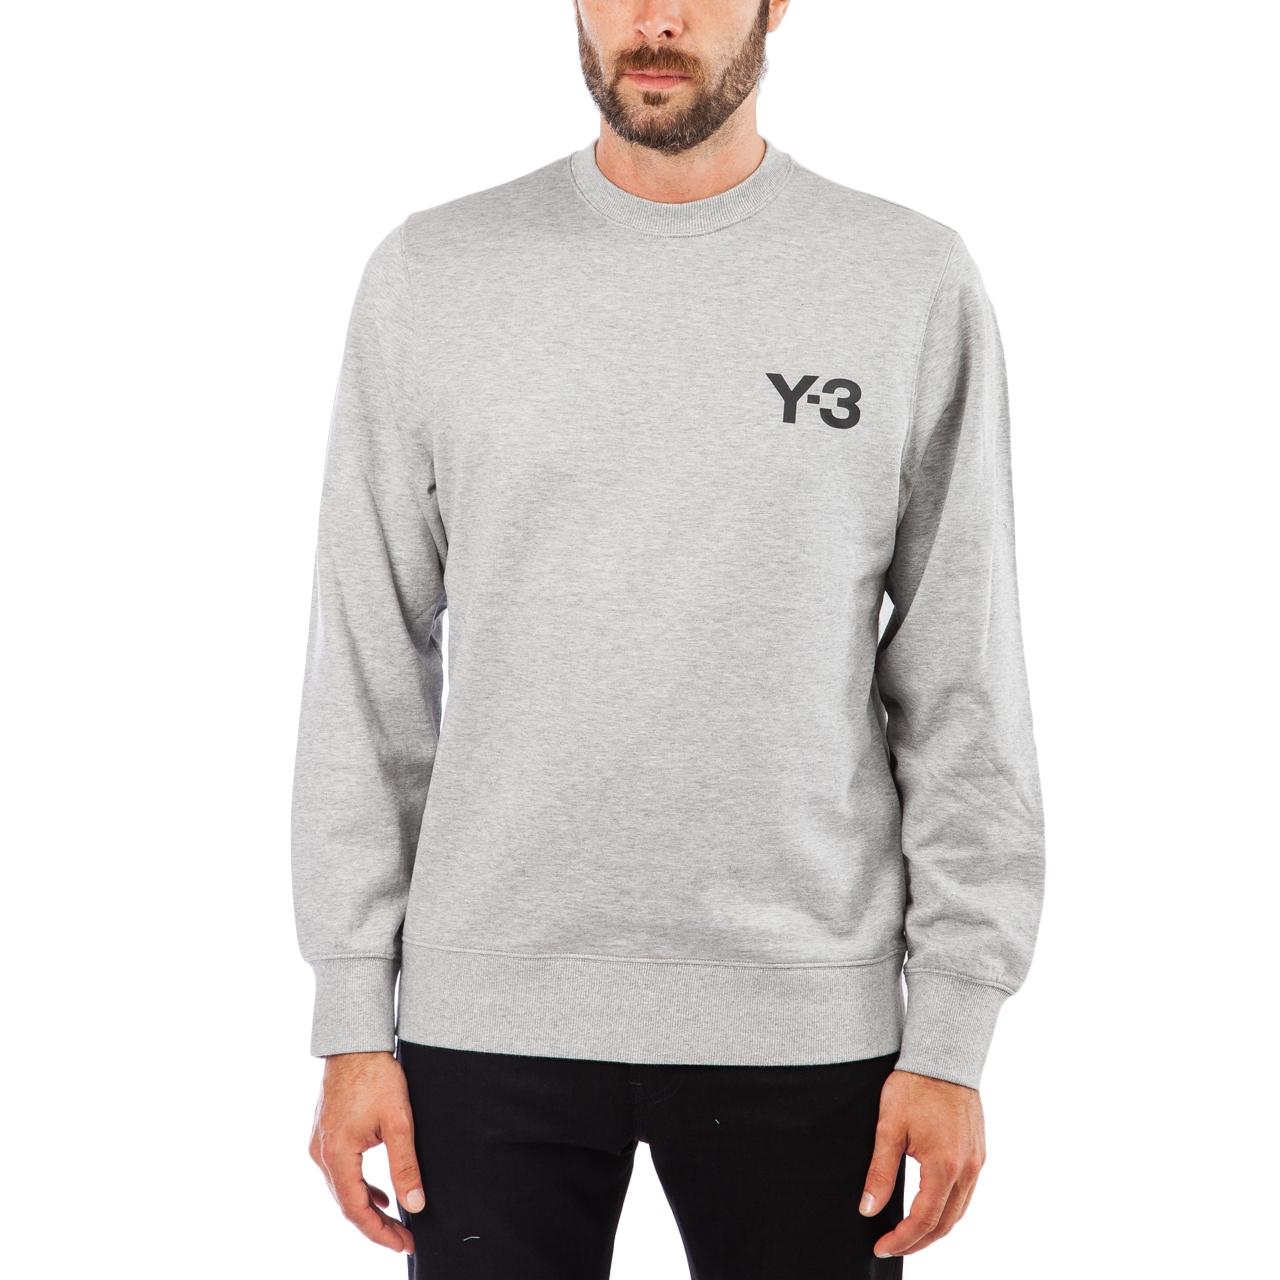 Y-3 Classic Longsleeve T-Shirt (Grau)